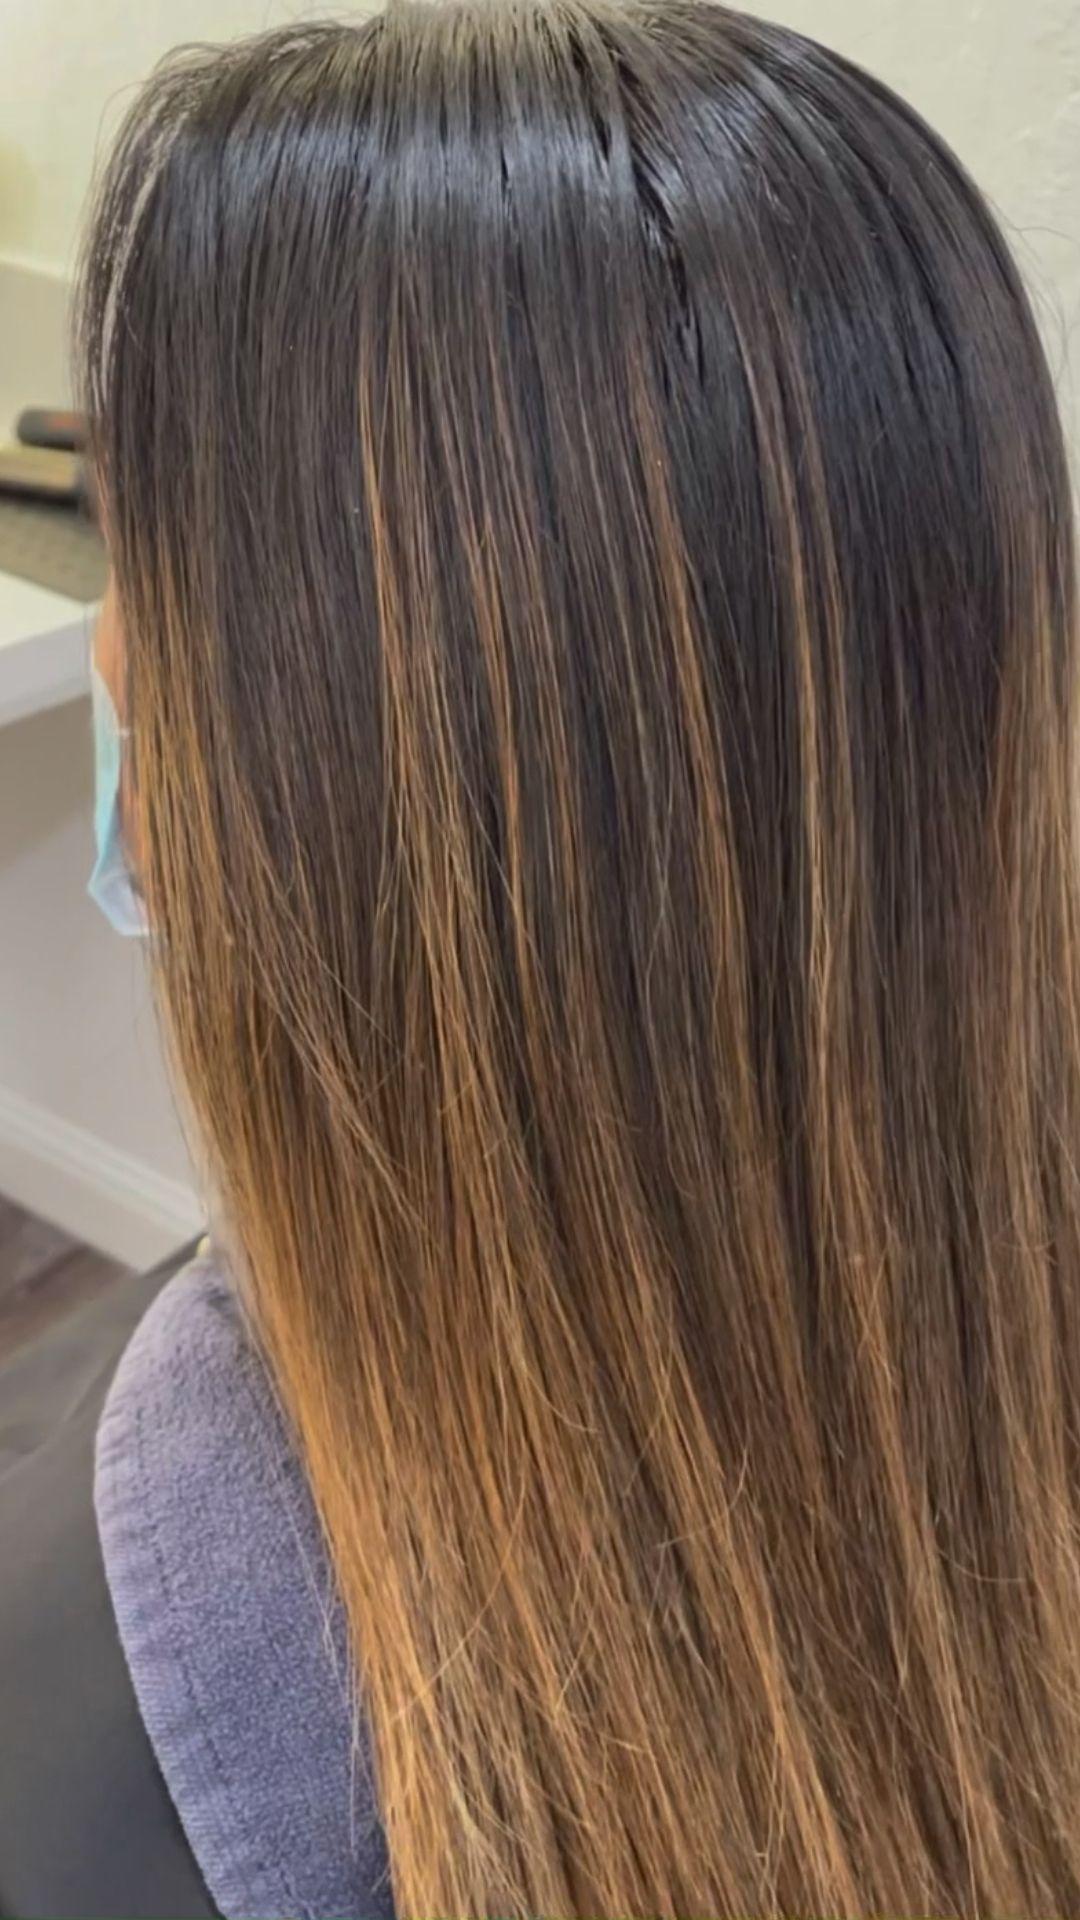 Highlights on dark brown hair